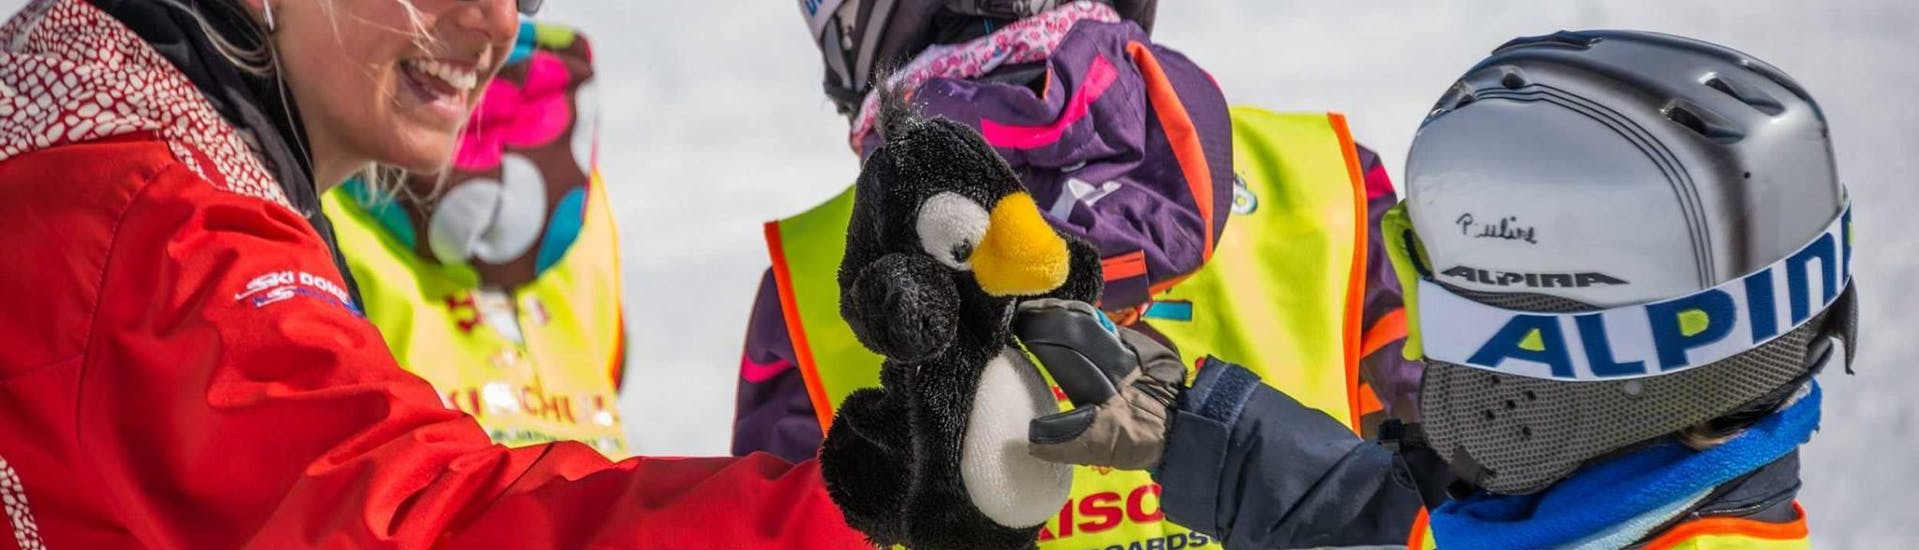 "Ski Lessons ""BOBOs Bambini-Club"" (2-3 years) - Beginner"